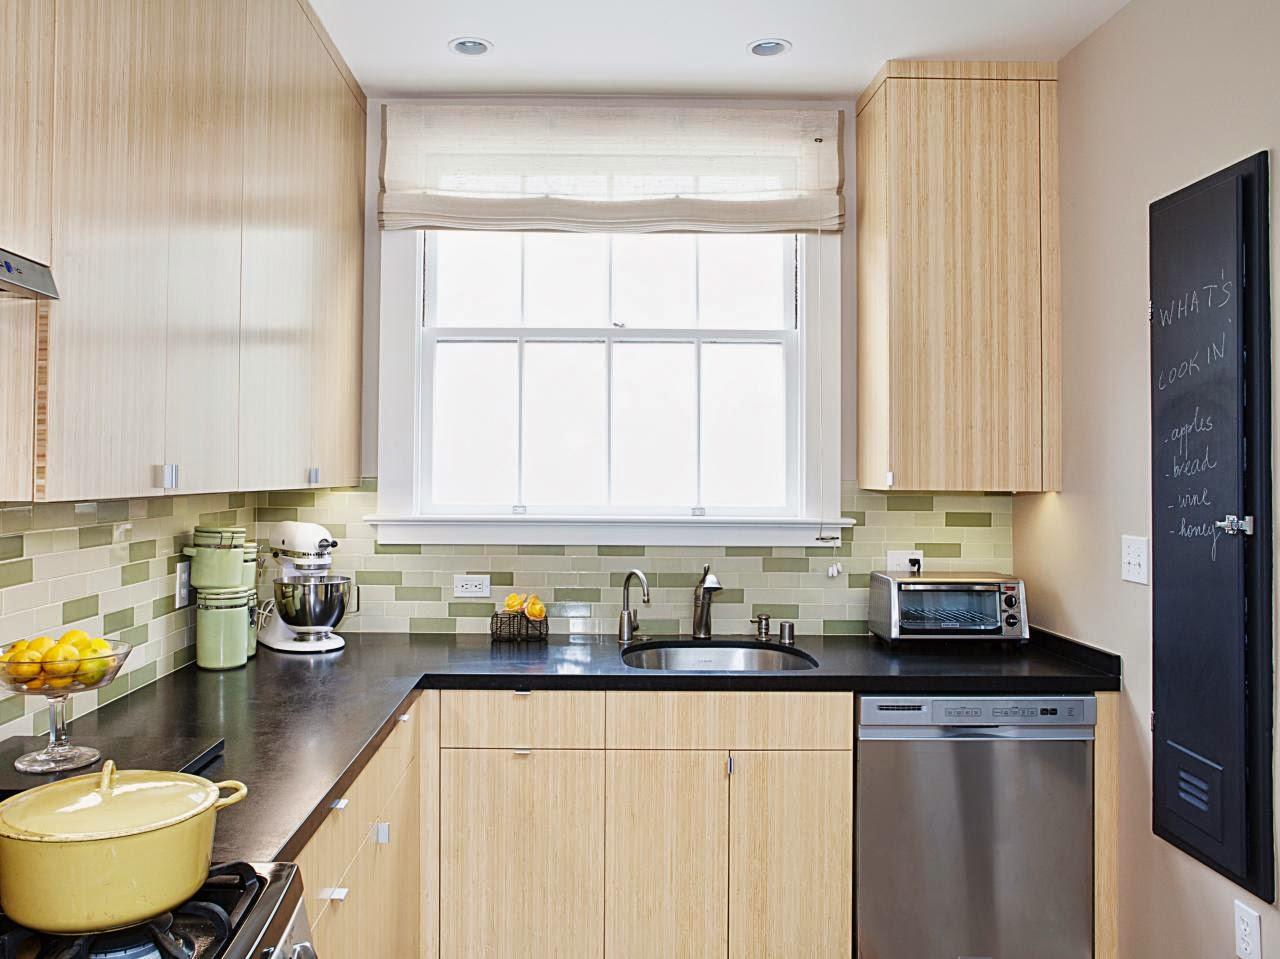 Cortinas para cocina fotos colores en casa - Ideas cortinas cocina ...